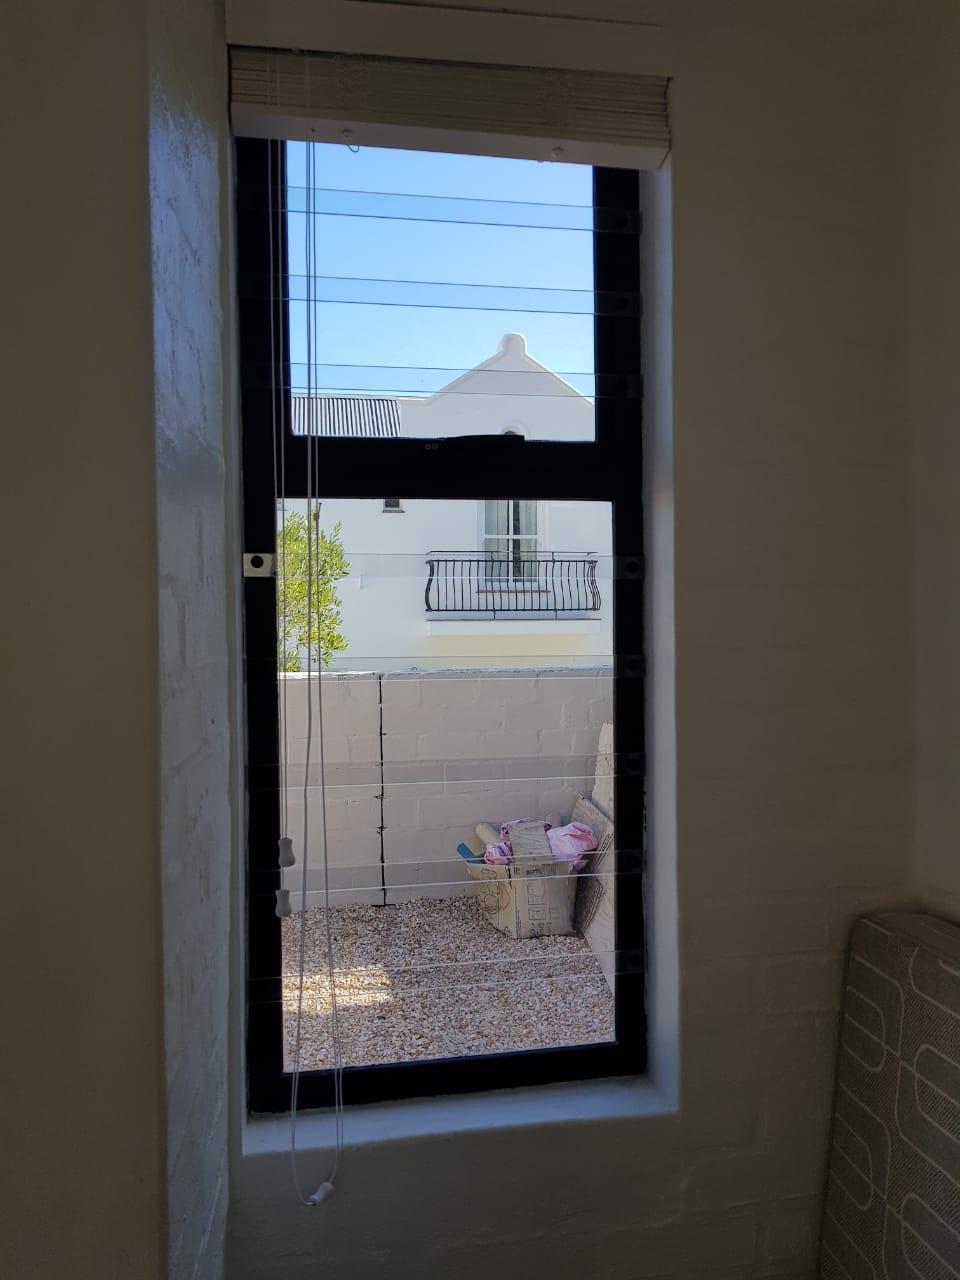 Transparent Burglar Bars, Clear View Burglar Bars, Polycarbonate Burglar Bar, perspex burglar bars